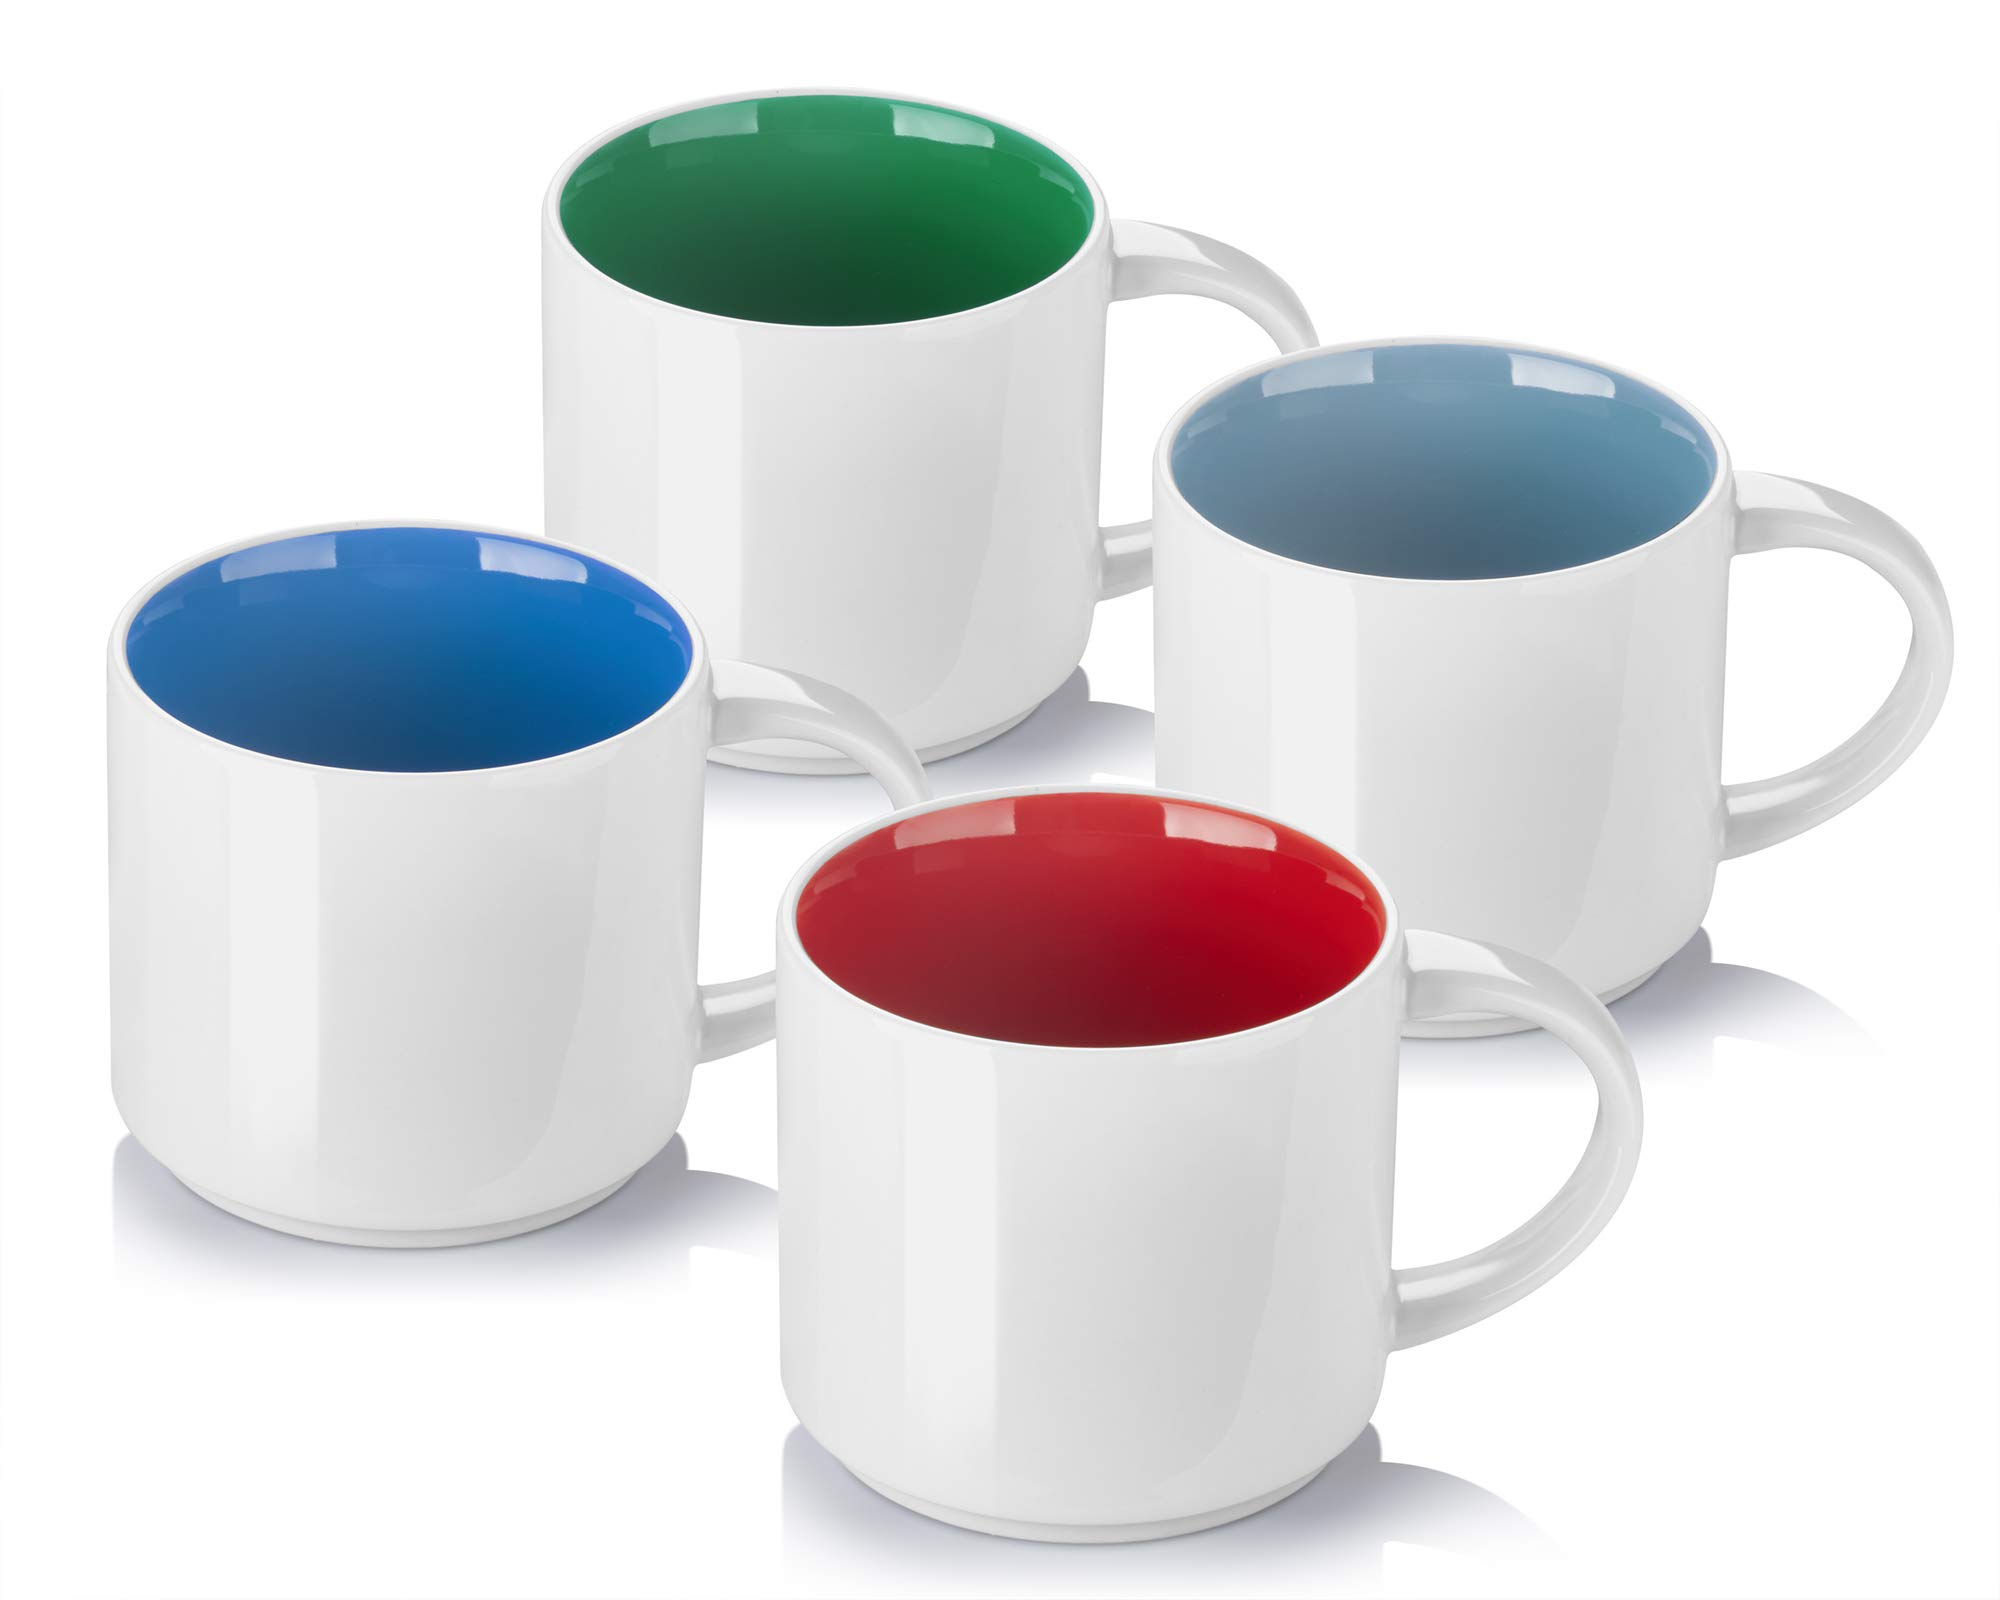 DOWAN Coffee Mugs, Porcelain Tea and Coffee Mug Set, Multicolor Inside-Set of 4 (16 oz)